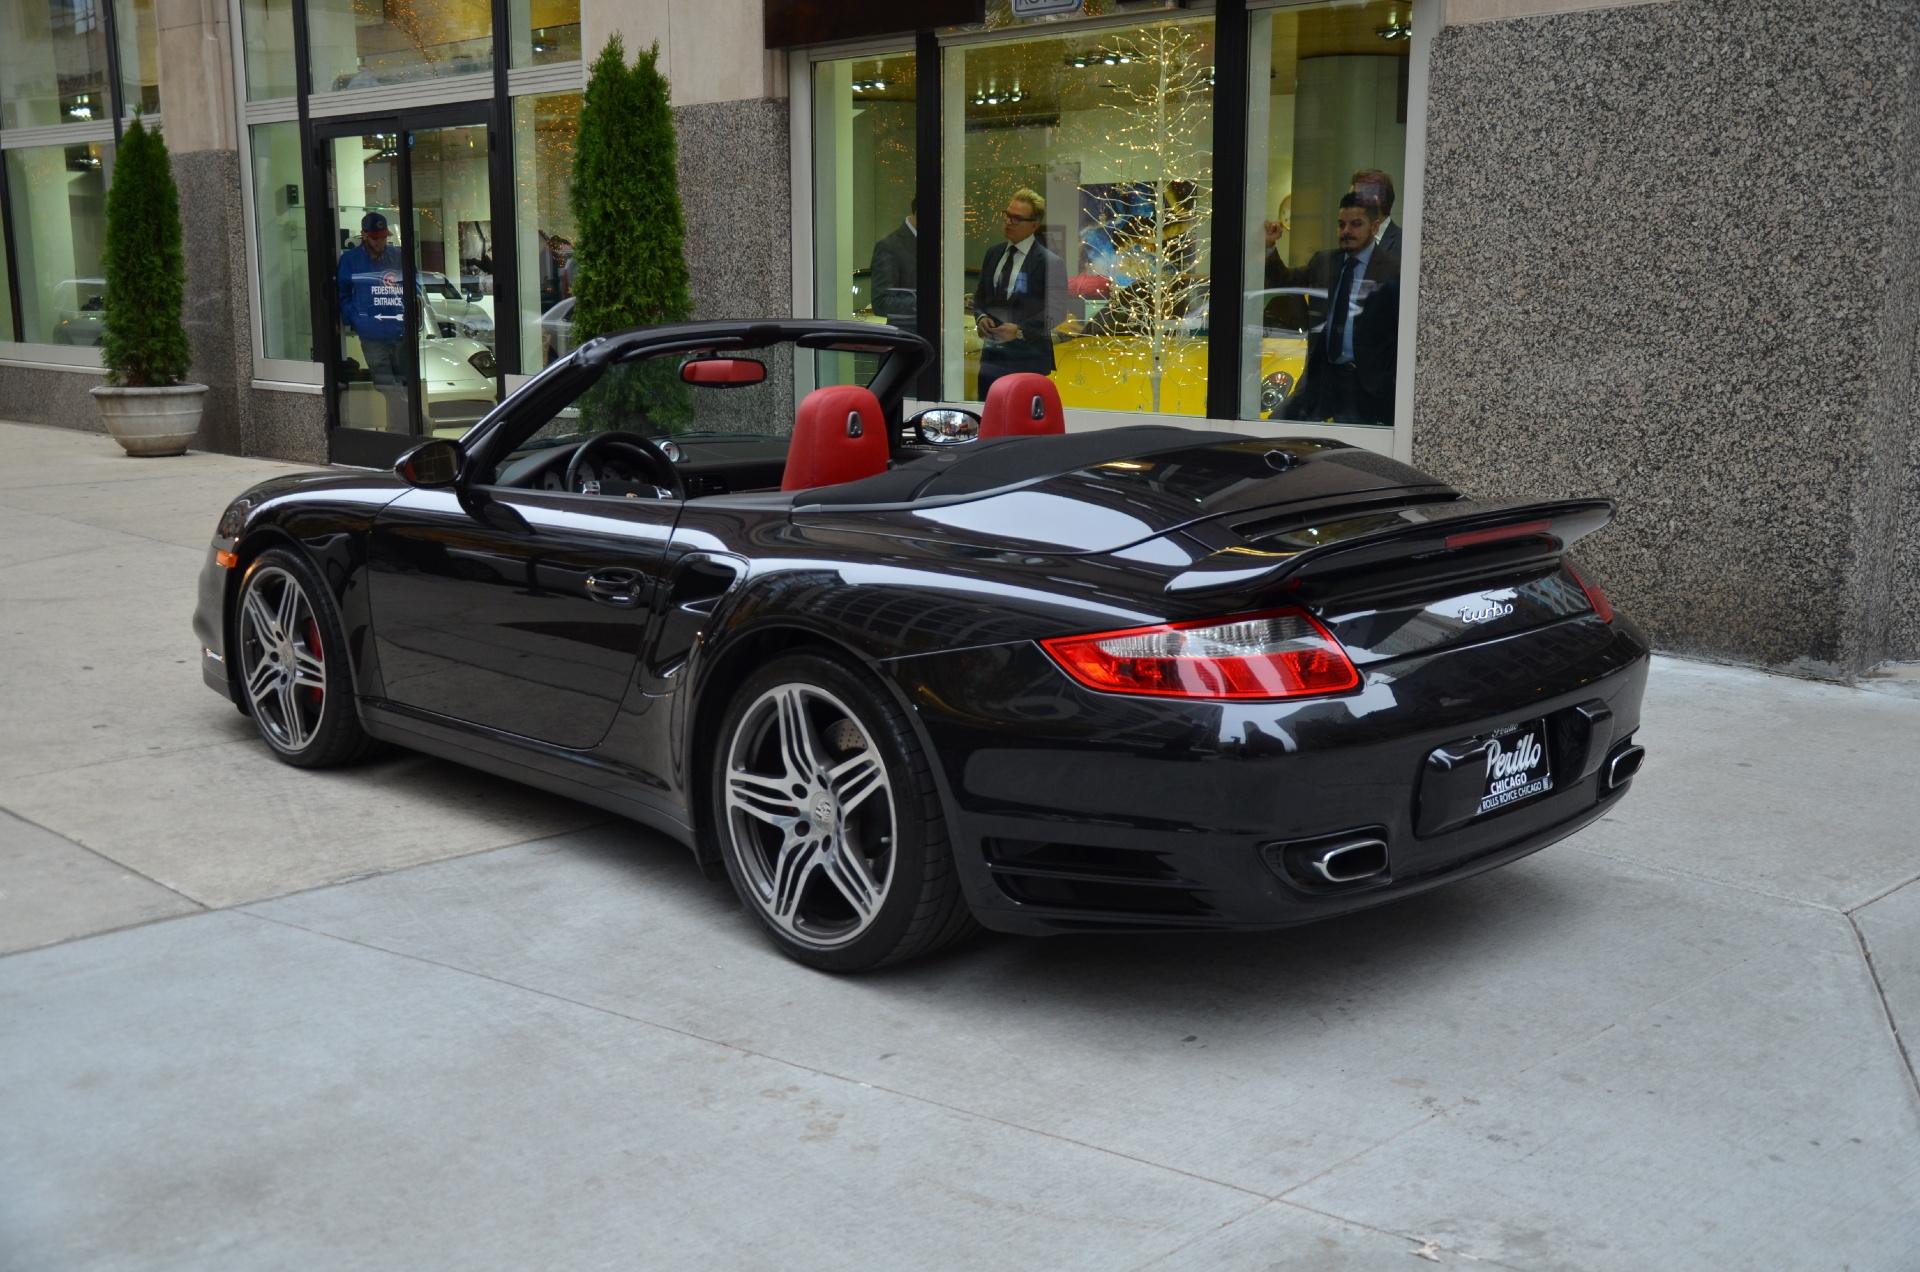 2009 porsche 911 turbo stock gc1788a for sale near chicago il il porsche dealer. Black Bedroom Furniture Sets. Home Design Ideas